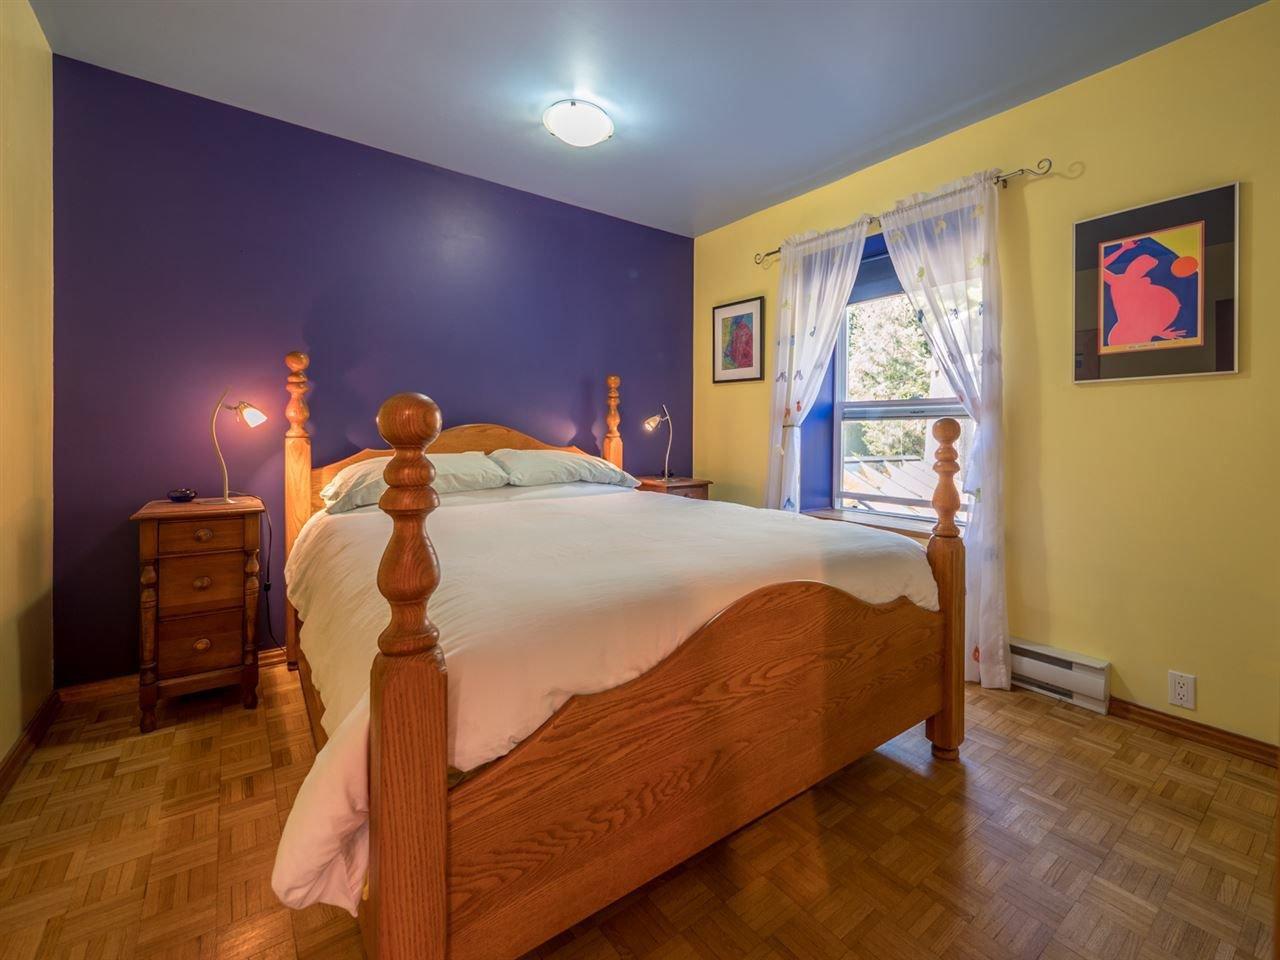 Photo 8: Photos: 3592 BEACH Avenue: Roberts Creek House for sale (Sunshine Coast)  : MLS®# R2244747